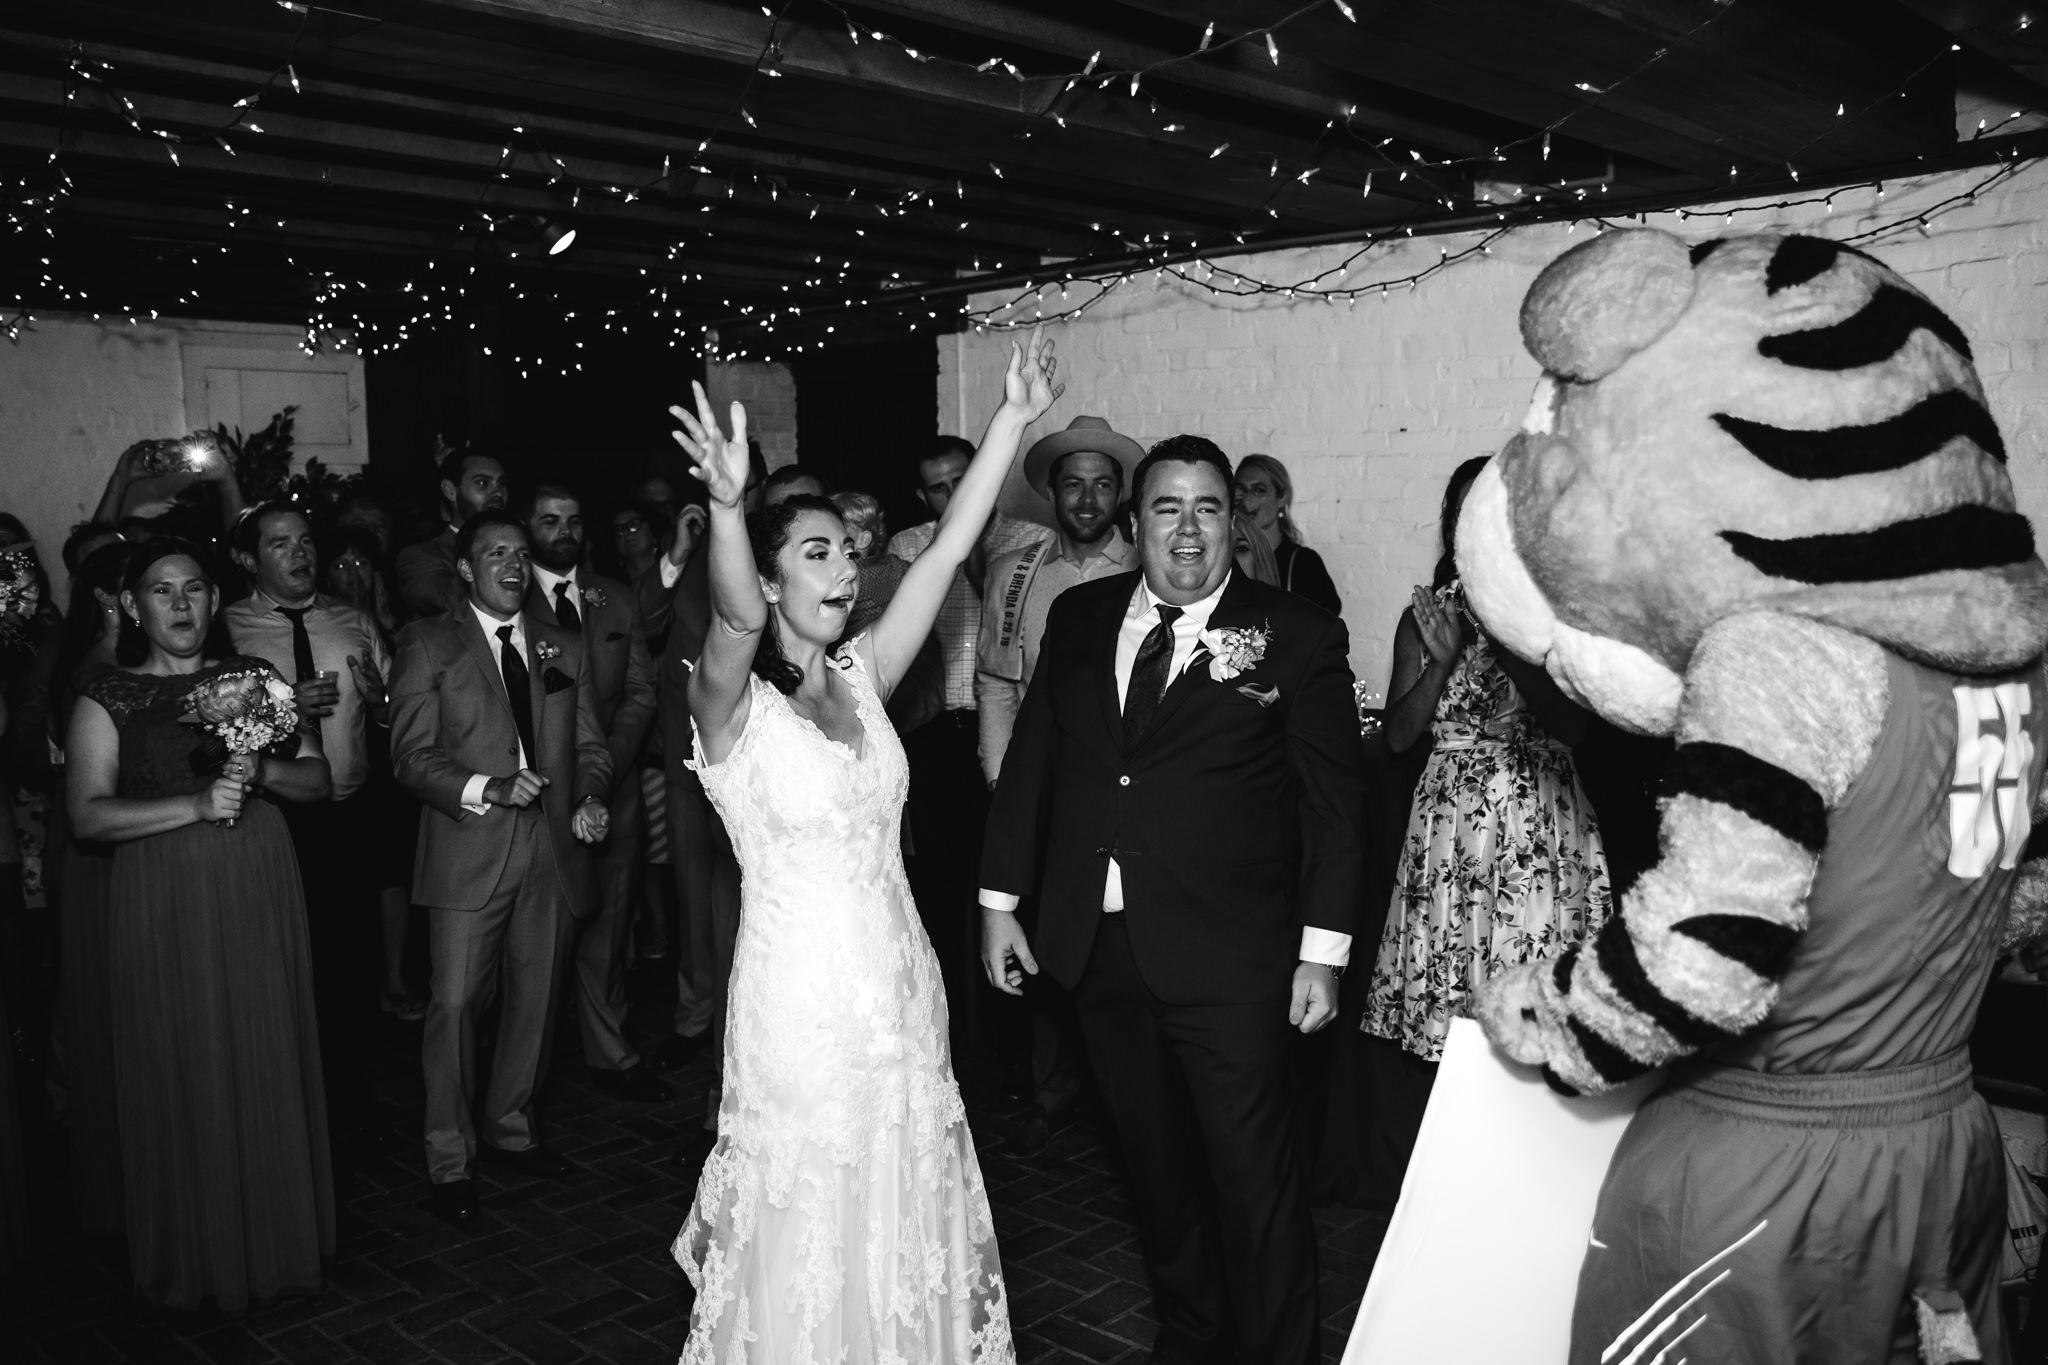 woodruff-fontaine-wedding-venue-memphis-thewarmtharoundyou-brenda-taylor-39.jpg